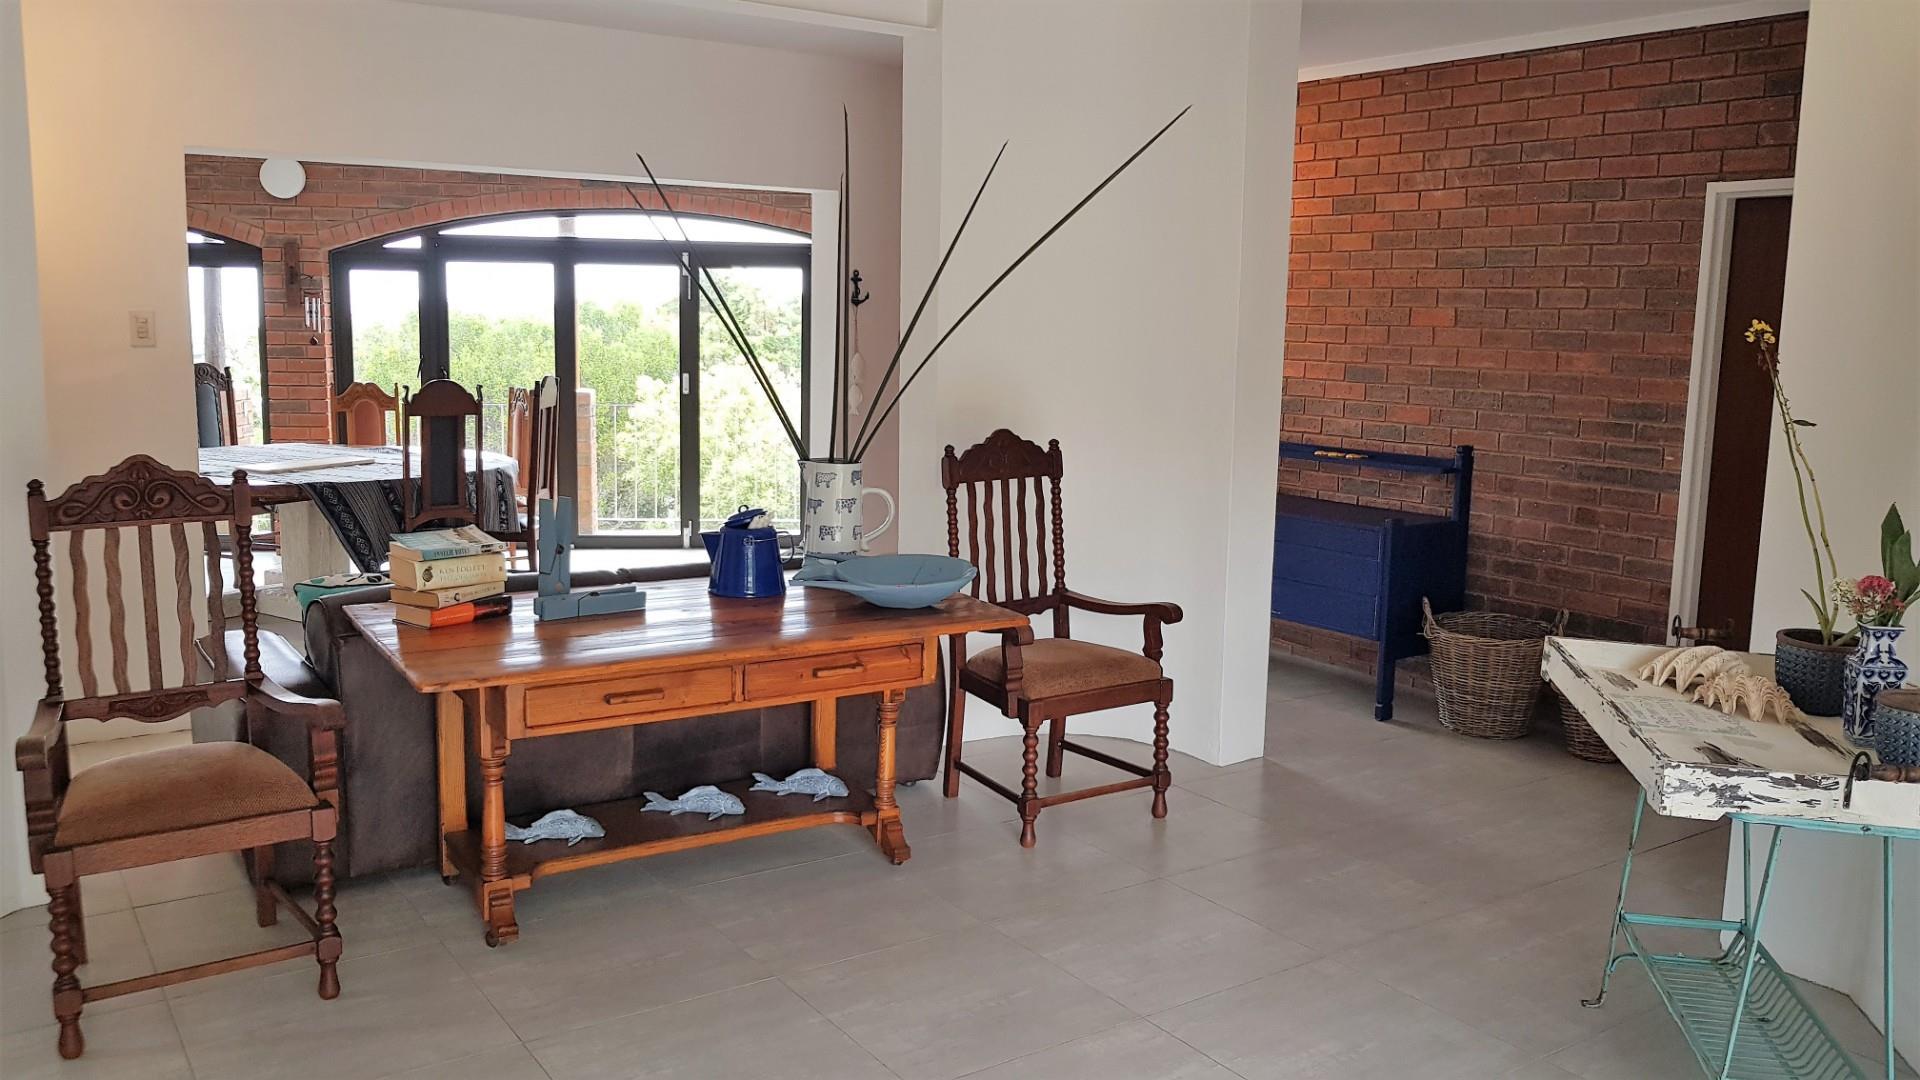 5 Bedroom House For Sale in Kenton On Sea